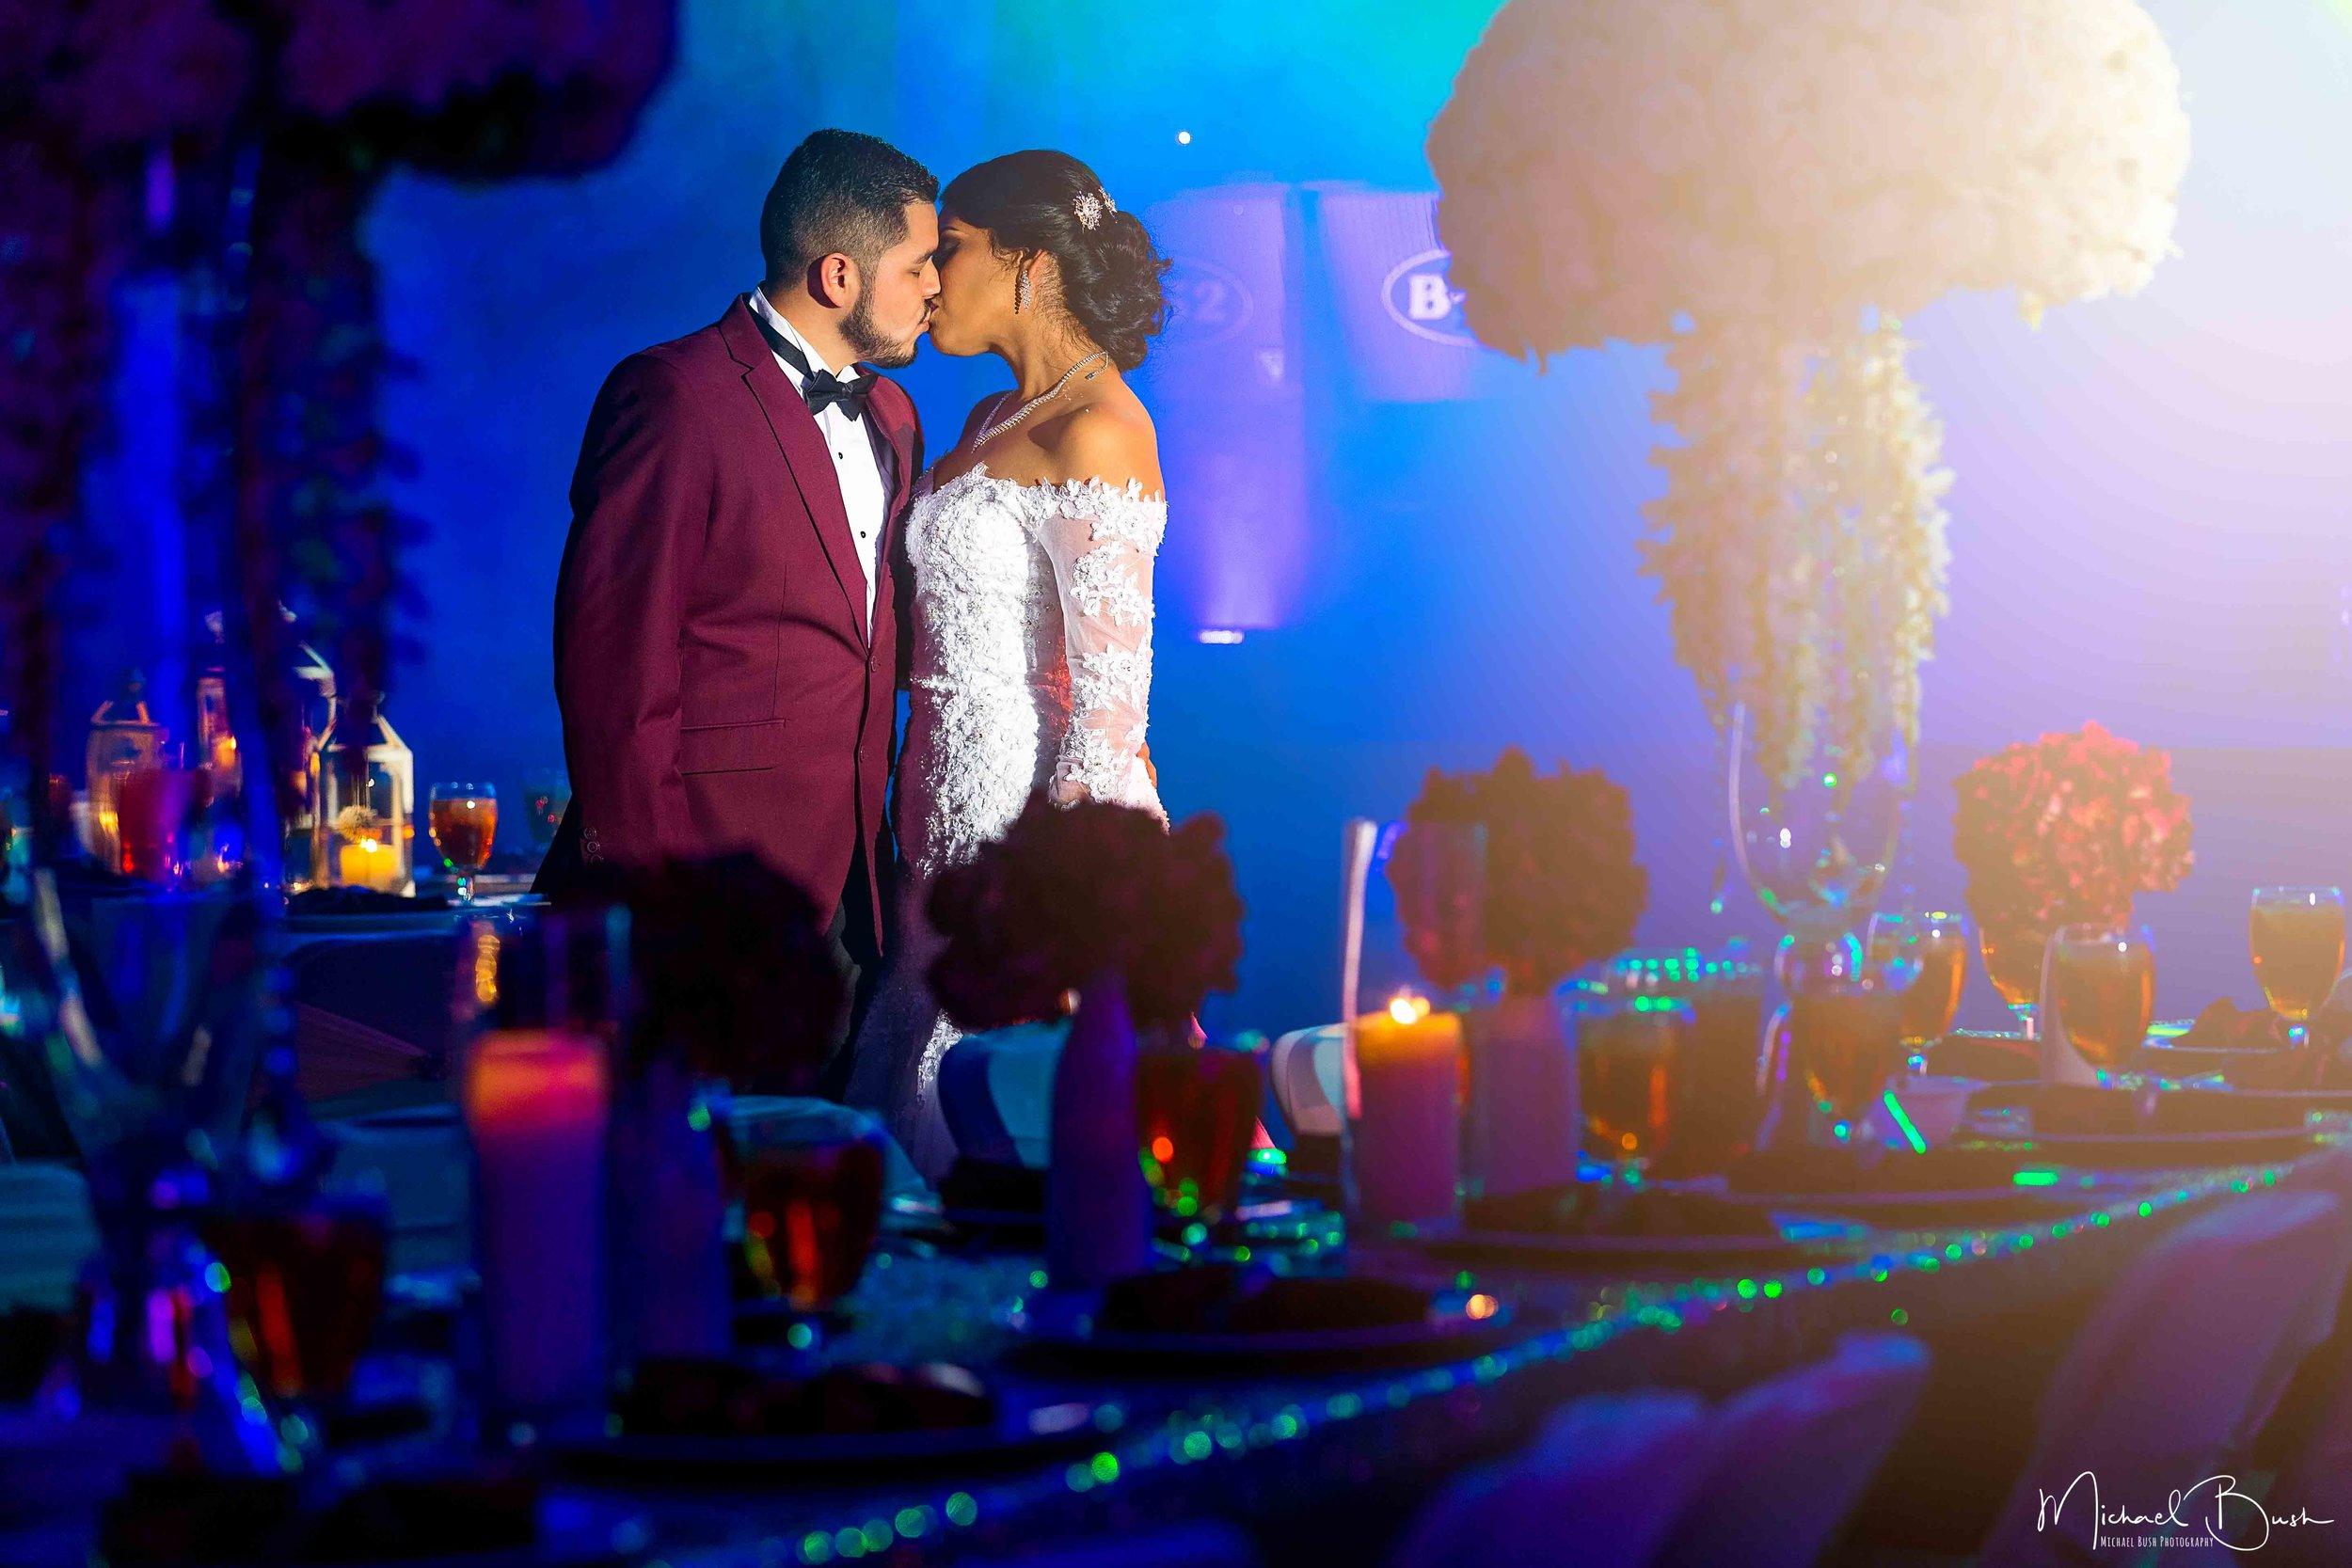 Wedding-Reception-Detials-Fort-Worth-Venue-dope-pic-mbushphotography-colors-smoke.jpg